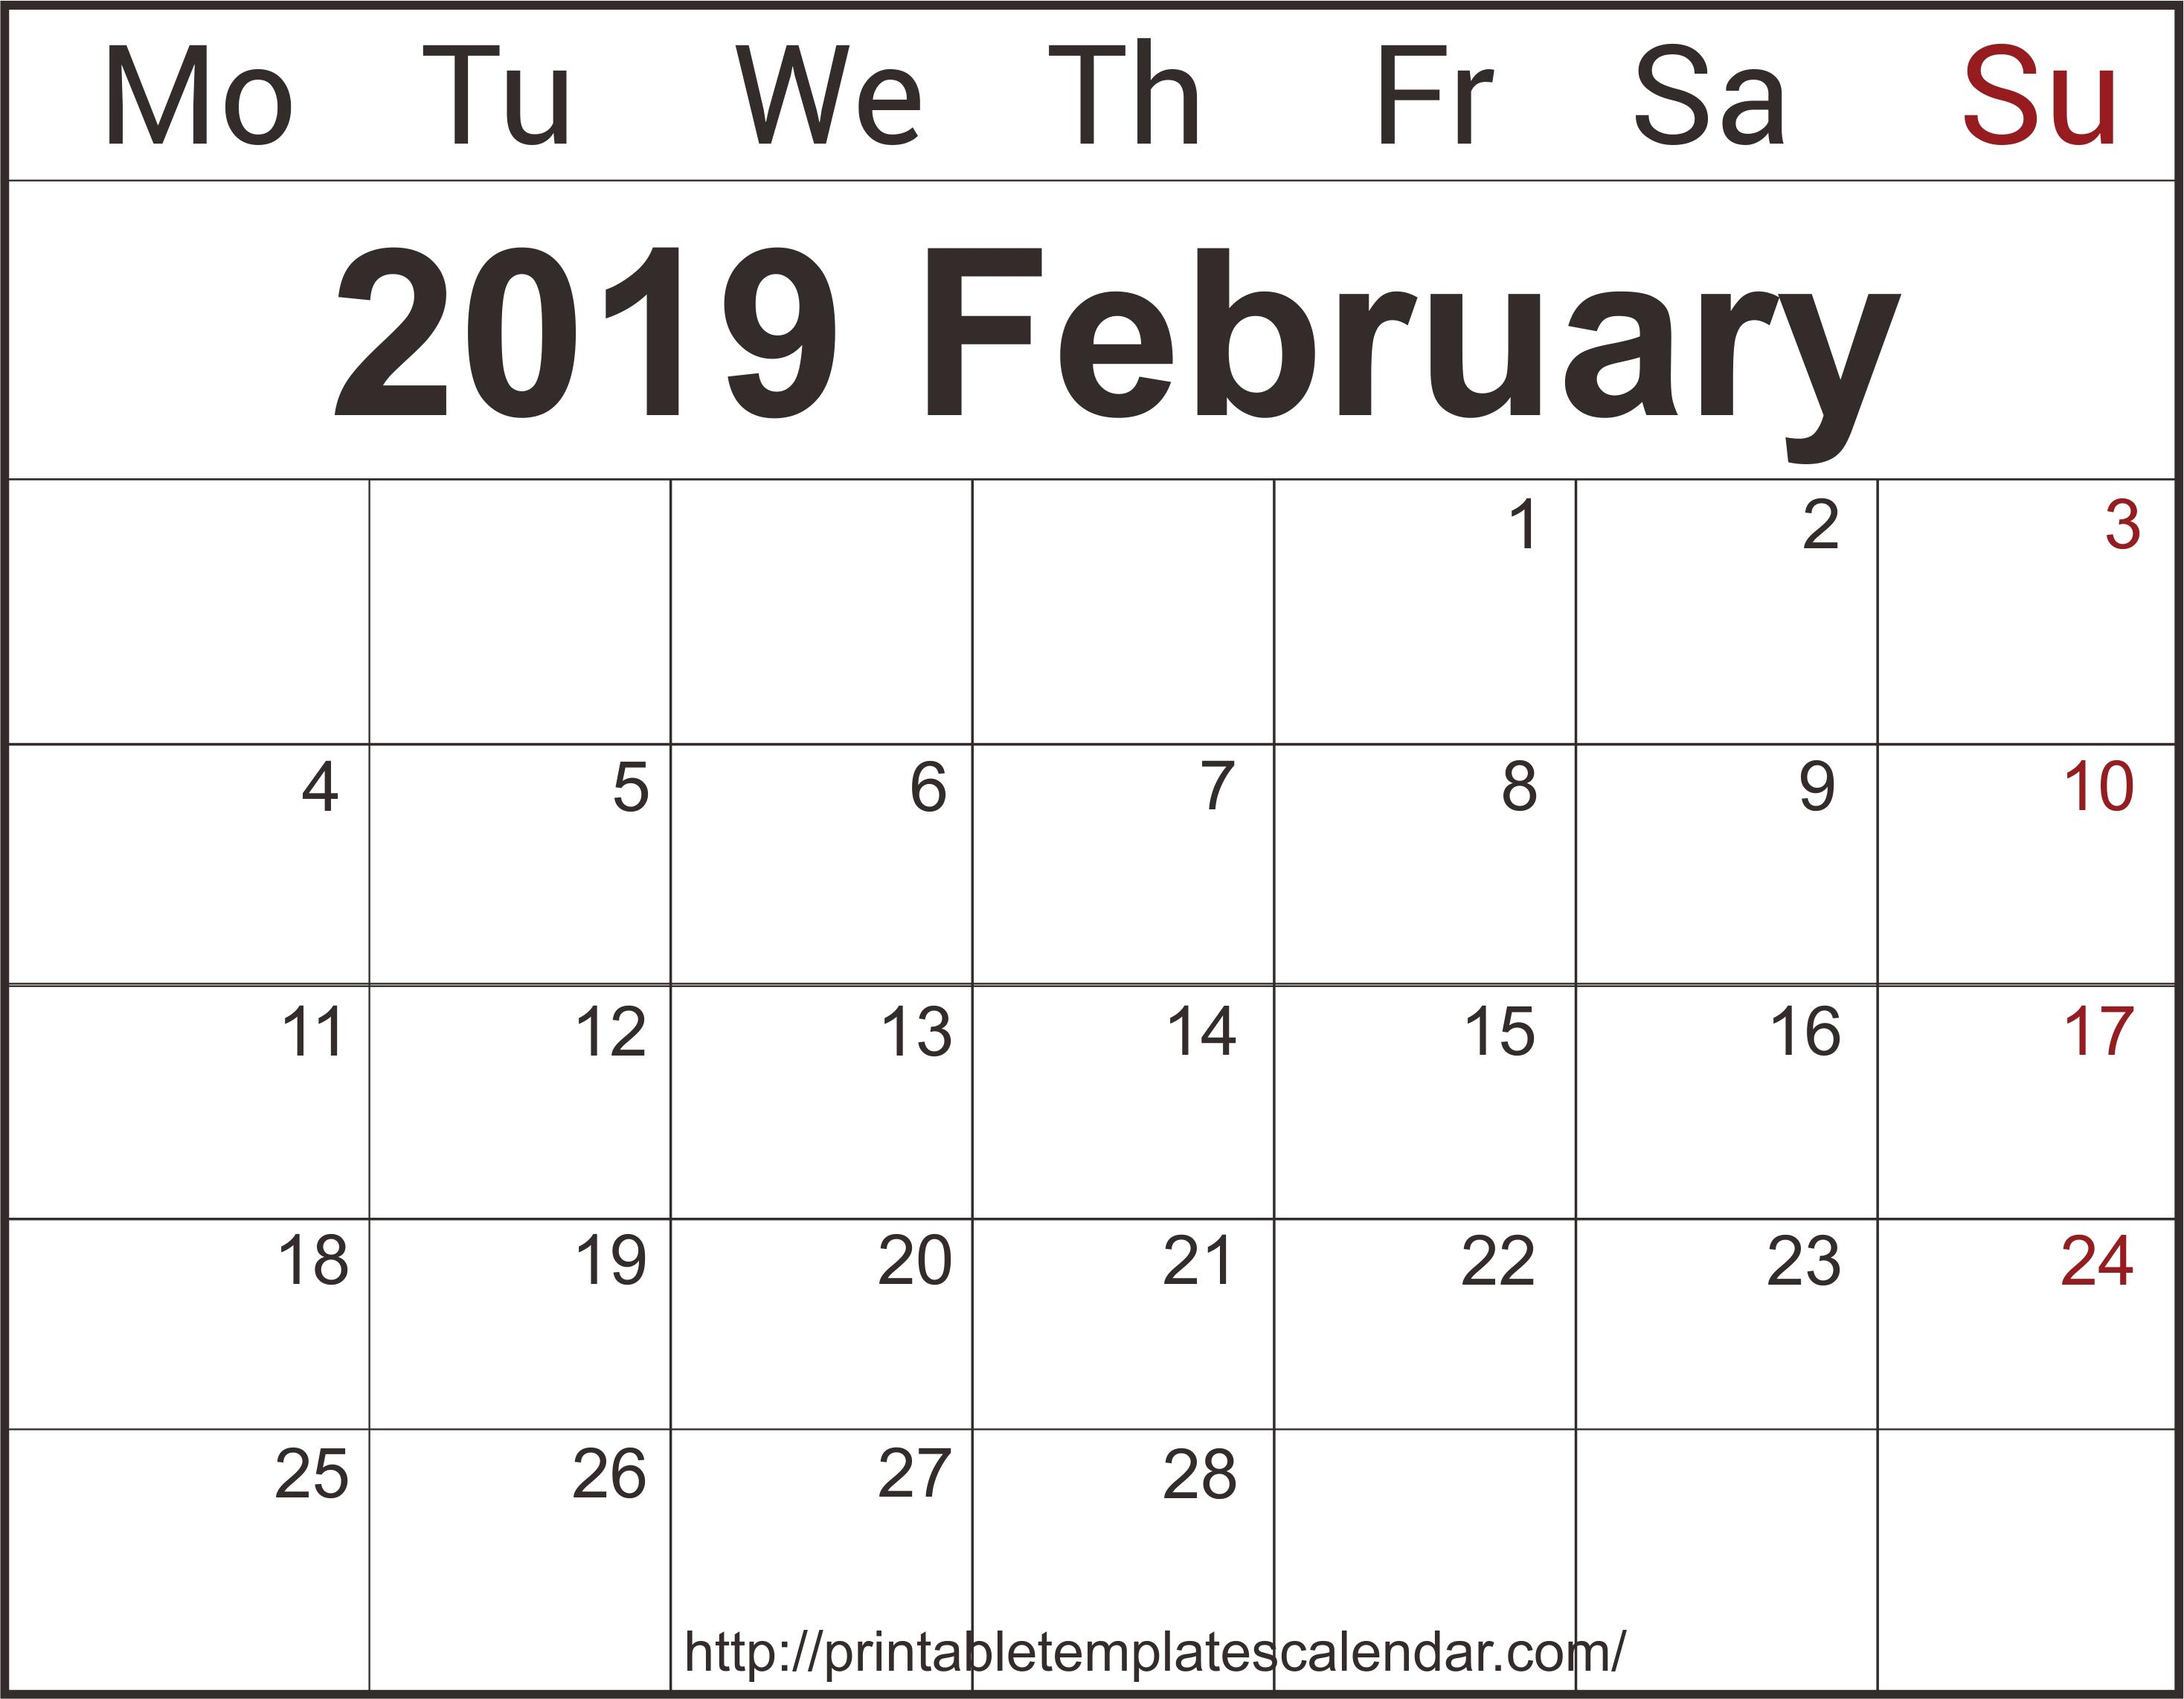 February Calendar 2019 Xls   Monthly Calendar Printable Templates Calendar 2019 Xls